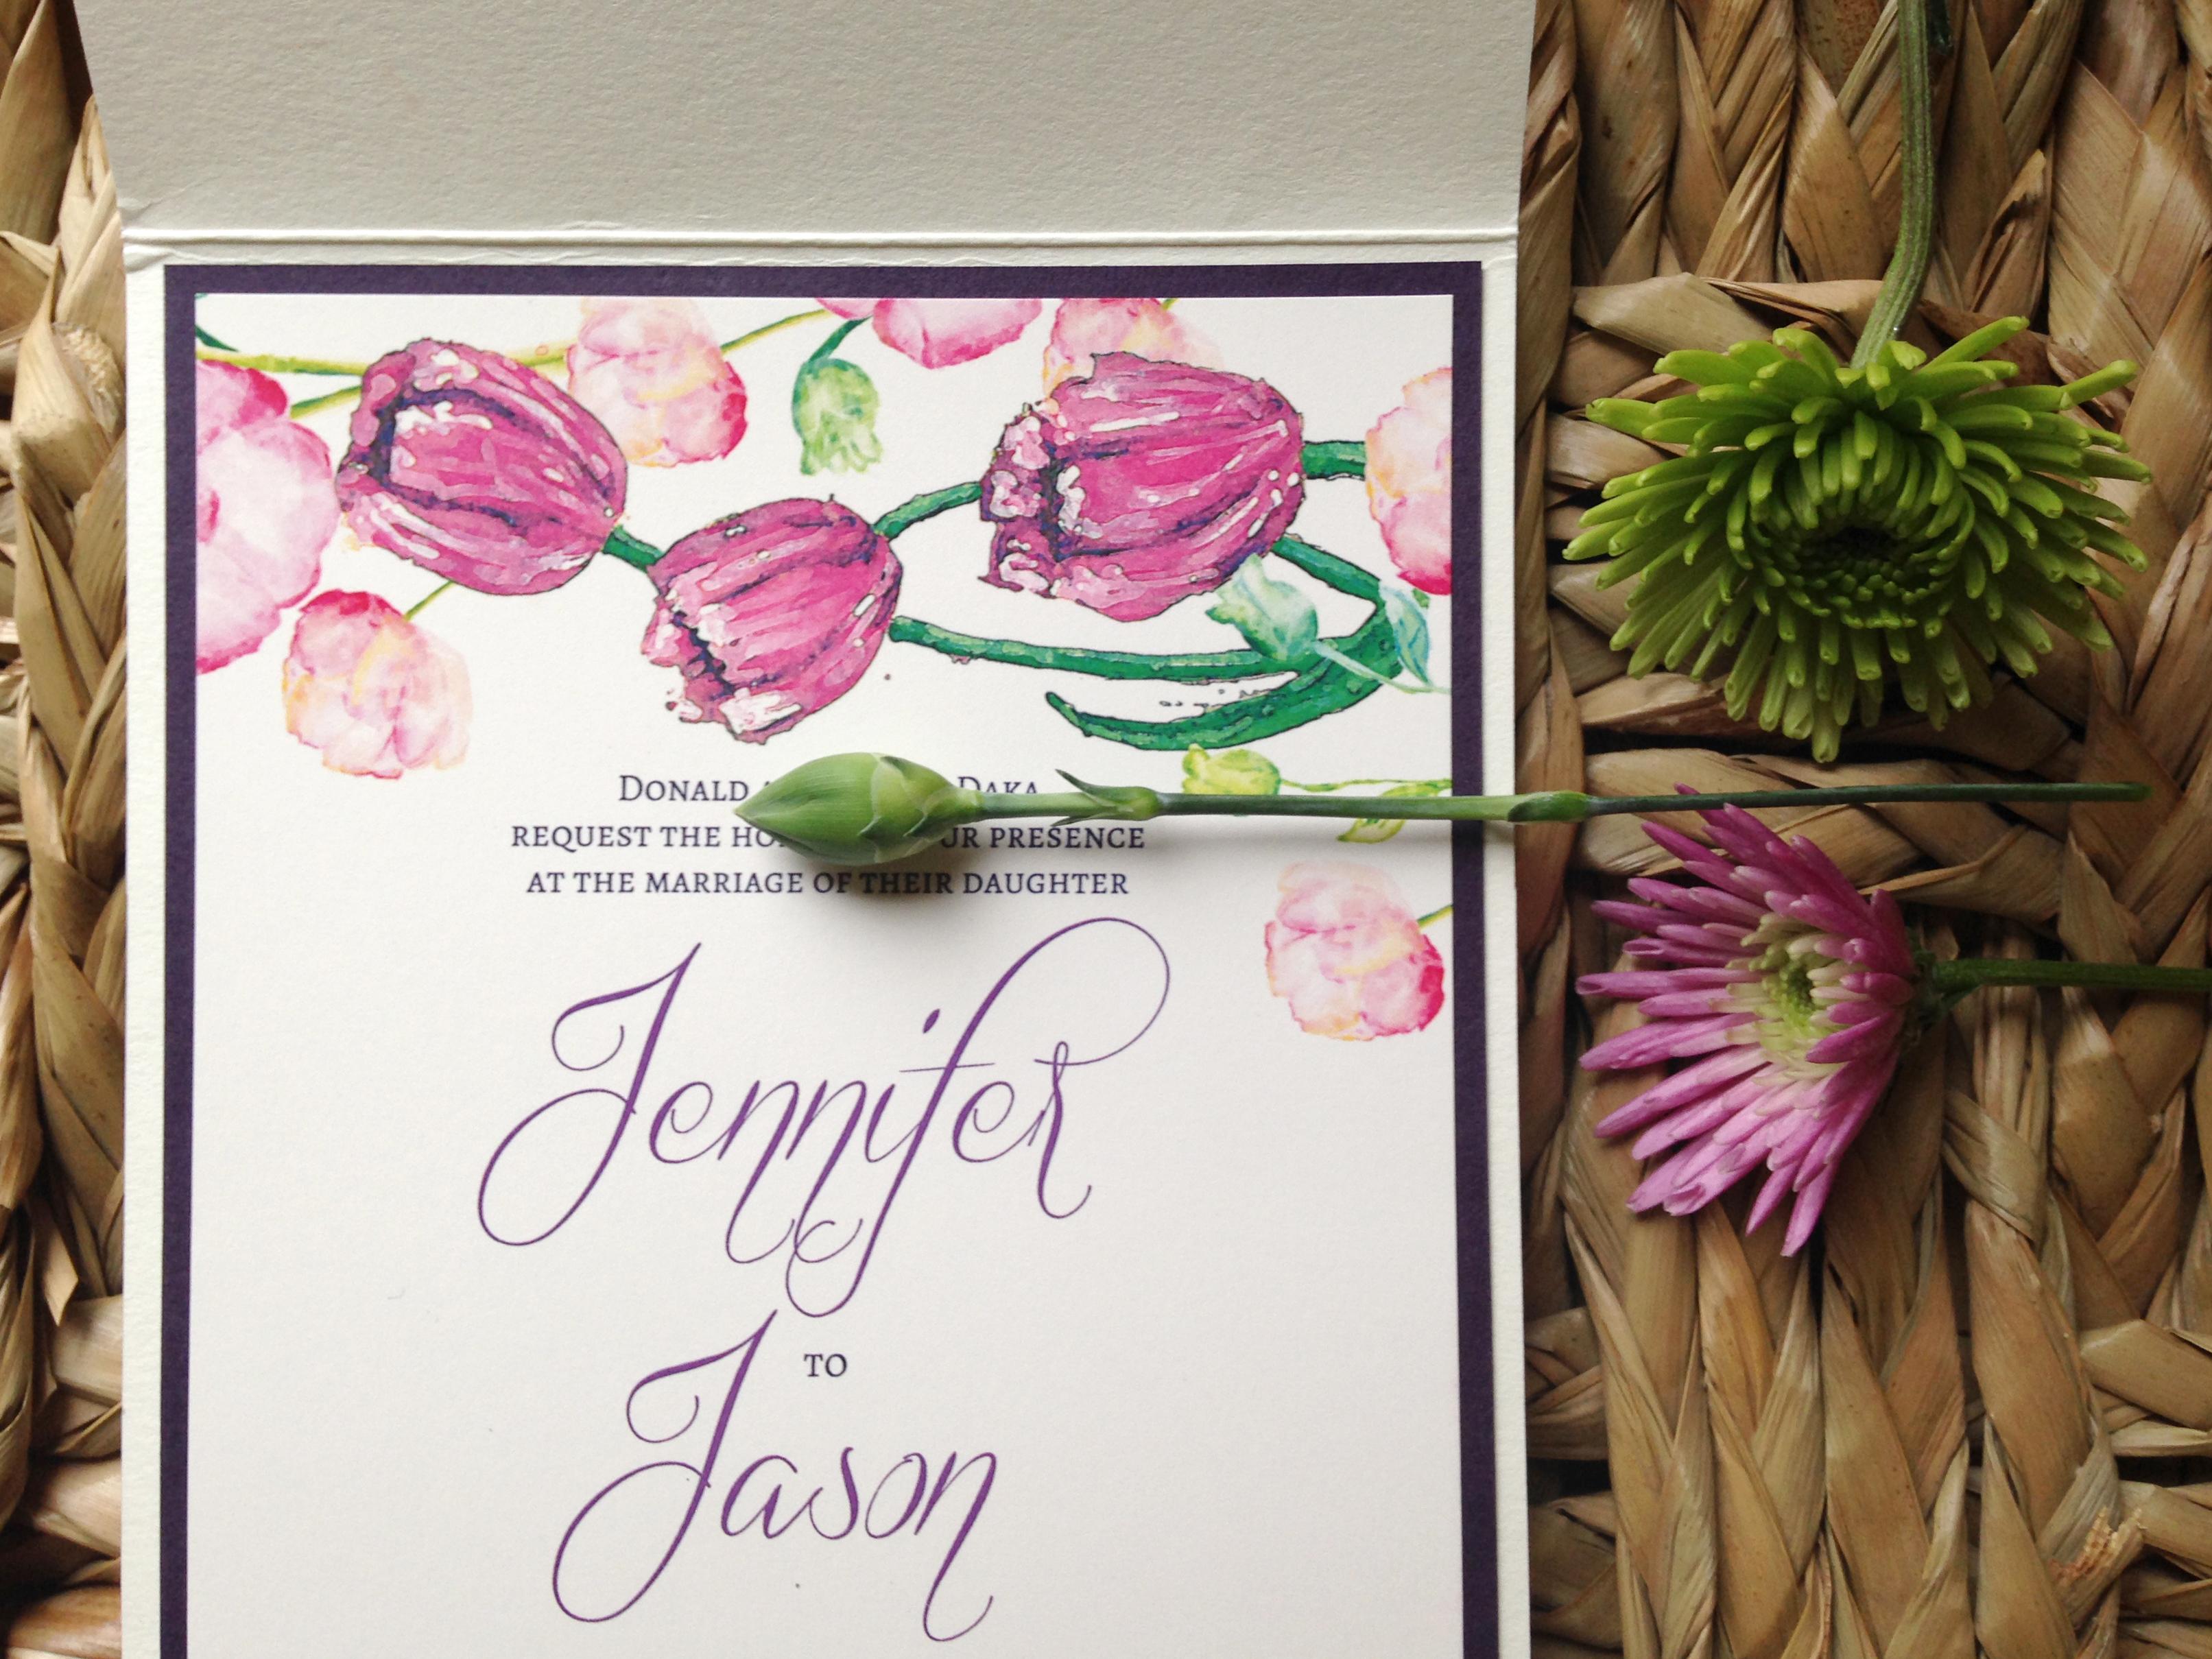 Customized Wedding Invitations: Spring Wedding Invitations With Custom Art